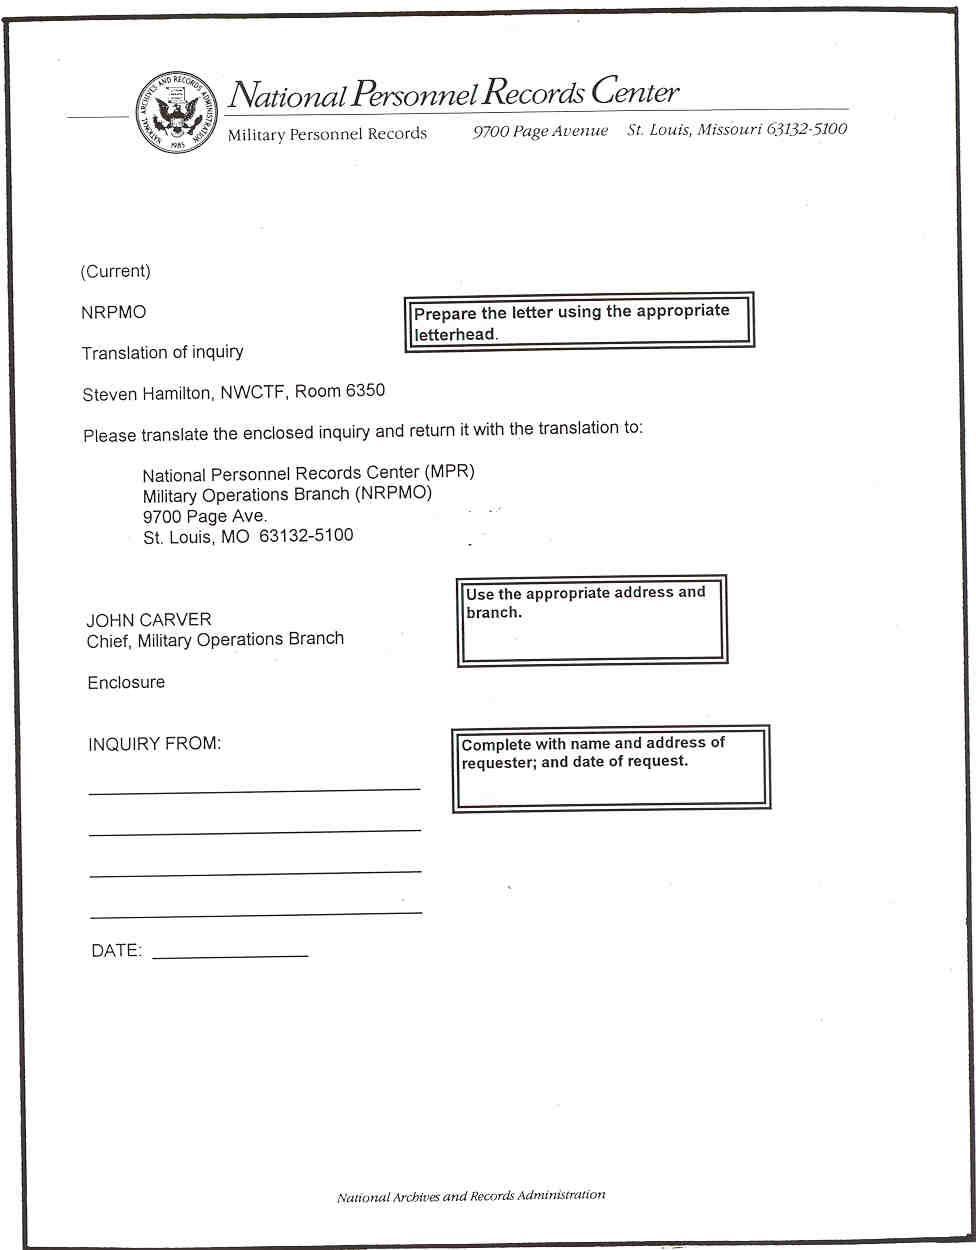 transmittal letter memo sample resumes sample cover letters transmittal letter memo sample transmittal letters sample letter templates figure3 sample letter of transmittal